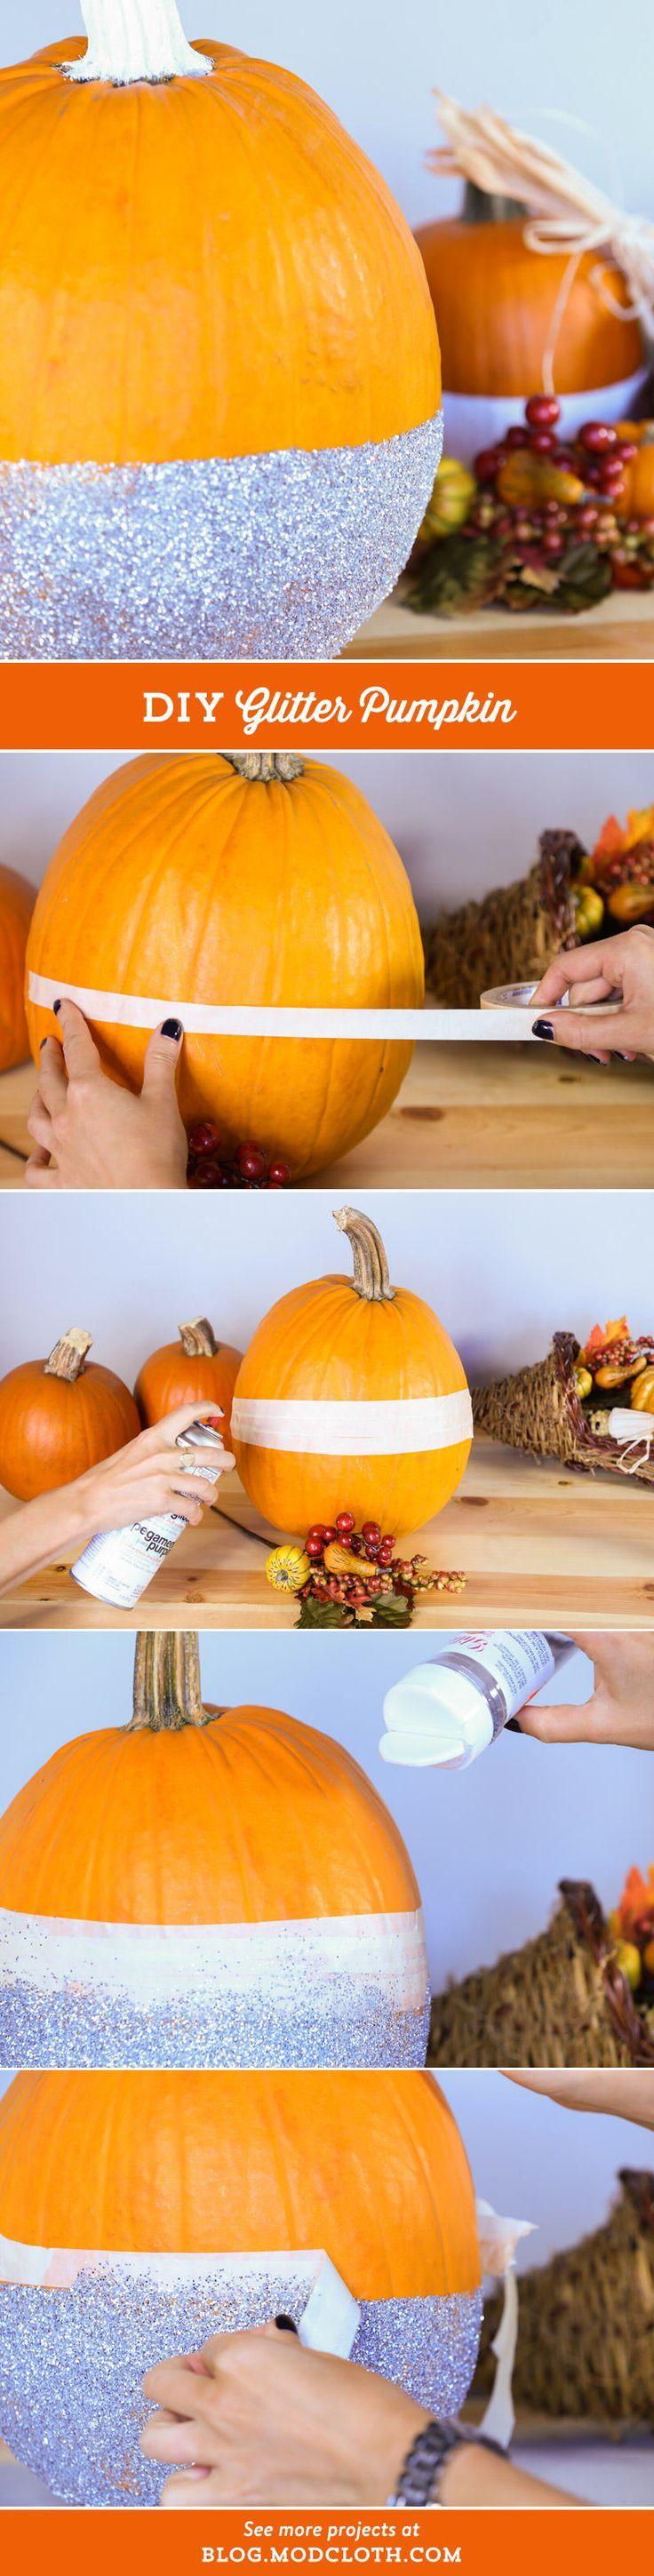 Disco pumpkin patch, anyone? Glam up your #Halloween decor with #DIY glitter pumpkins!